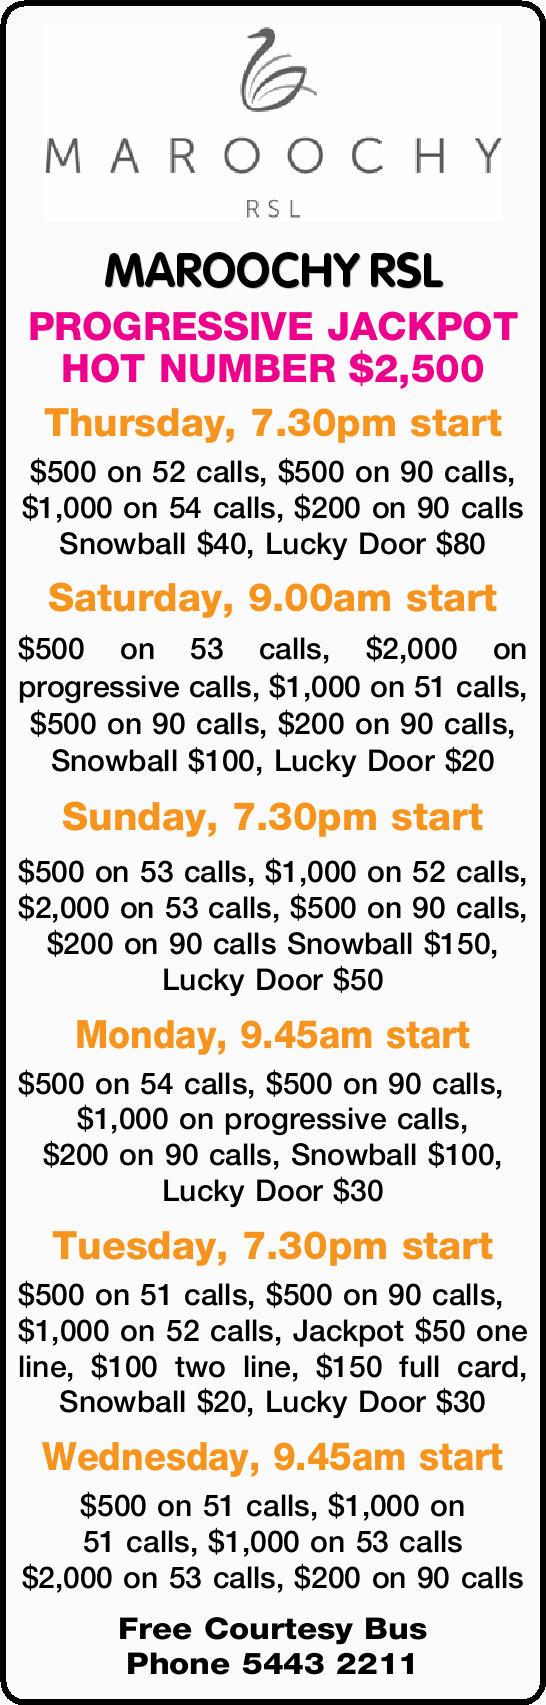 MAROOCHY RSL PROGRESSIVE JACKPOT HOT NUMBER $2,500 Thursday, 7.30pm start $500 on 52 calls, $500...